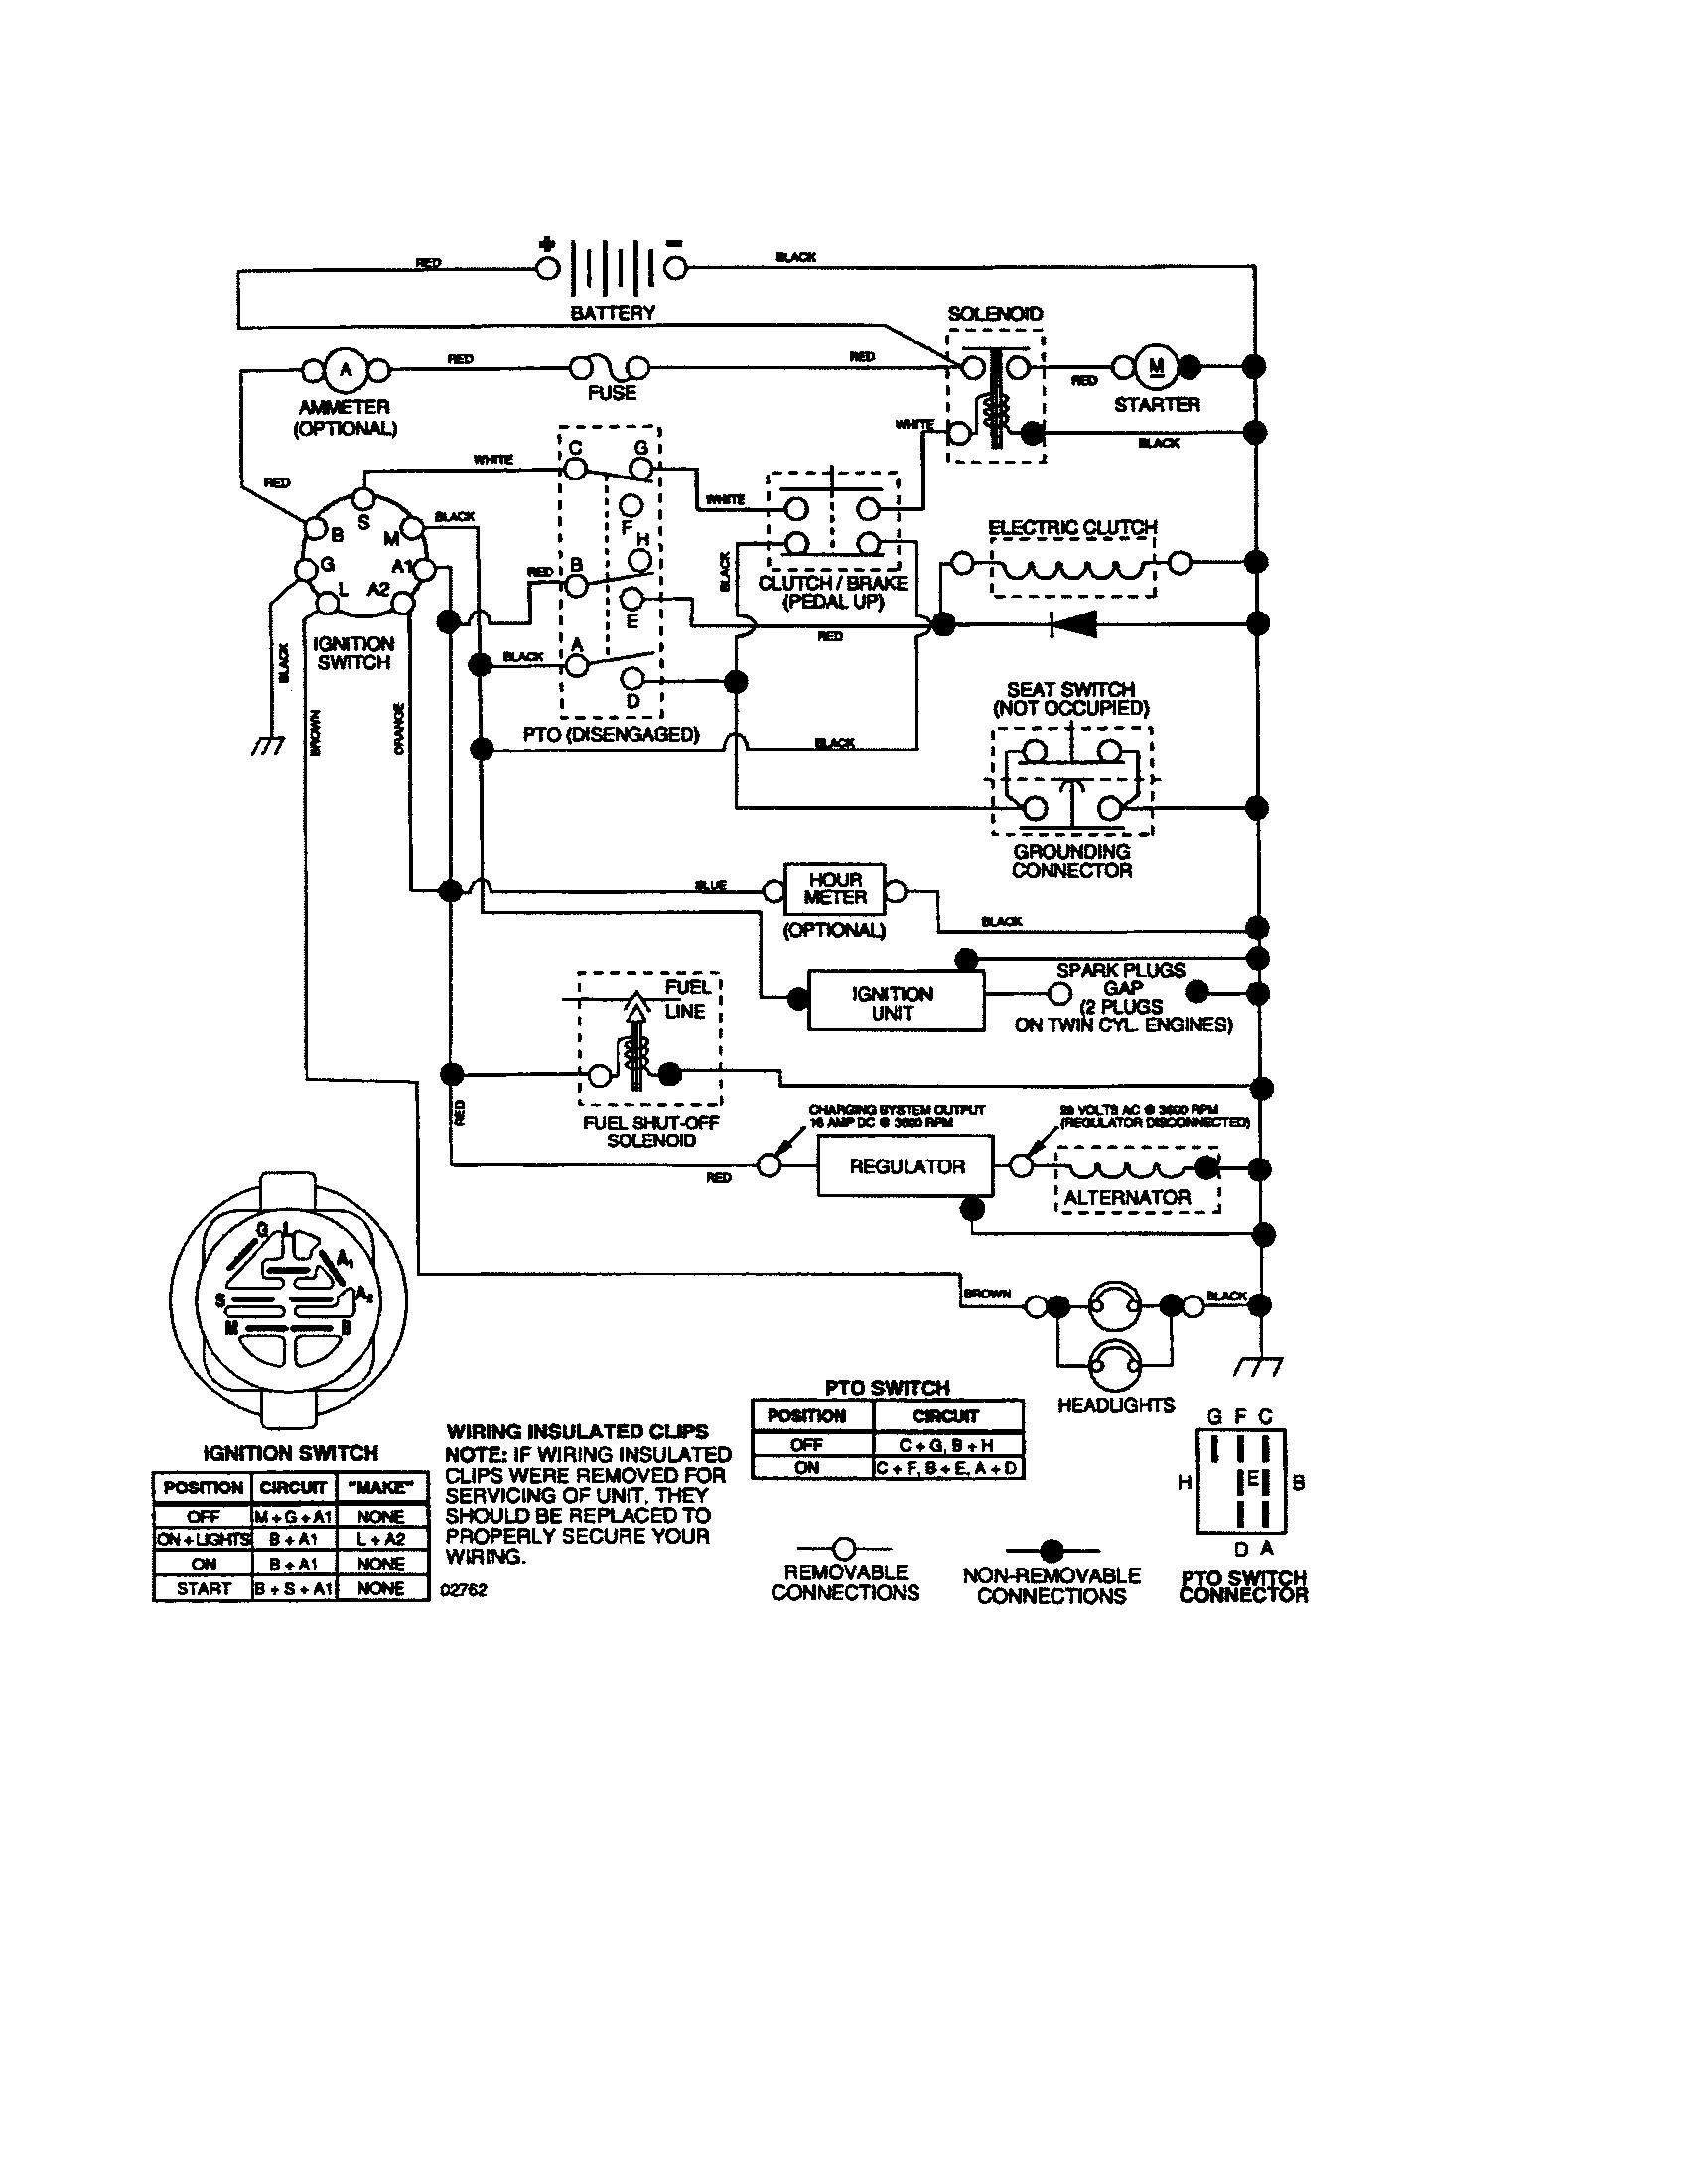 Wiring Diagram For Craftsman Riding Mower Inspiration Free Lawn